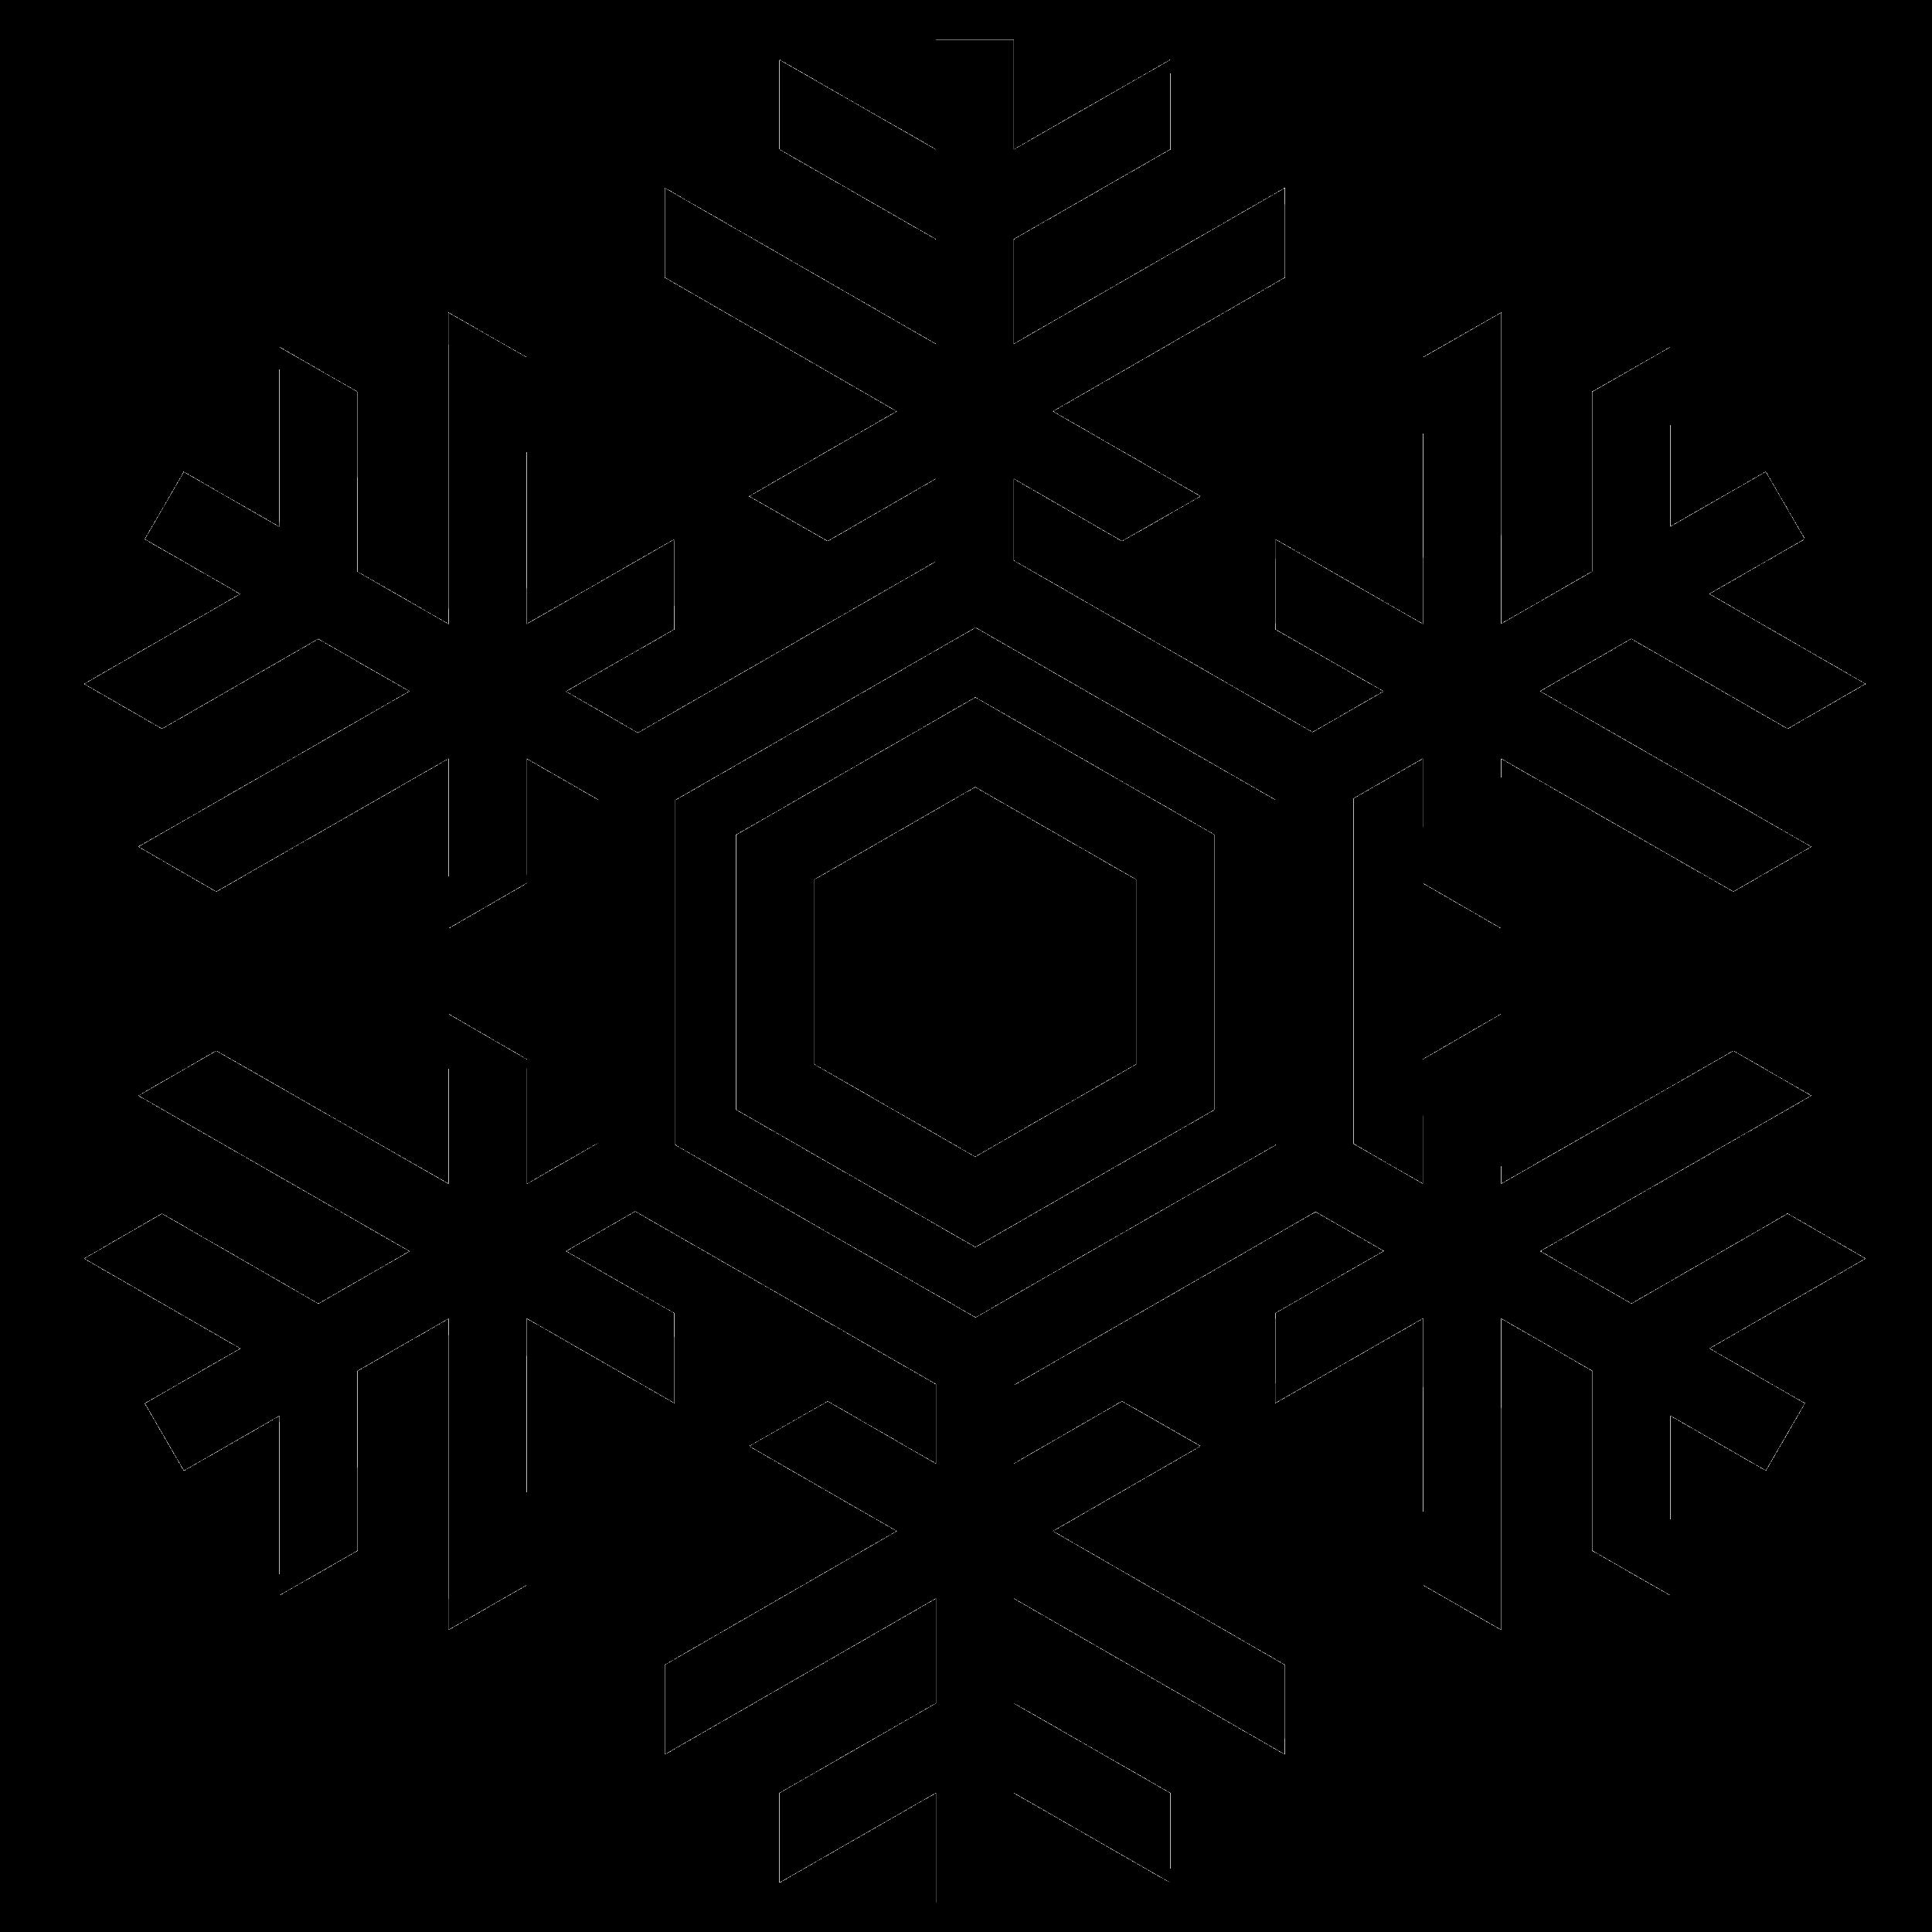 Snowflake vector clipart jpg free download Snowflake Euclidean vector Clip art - Snowflake Silhouette Png Image ... jpg free download